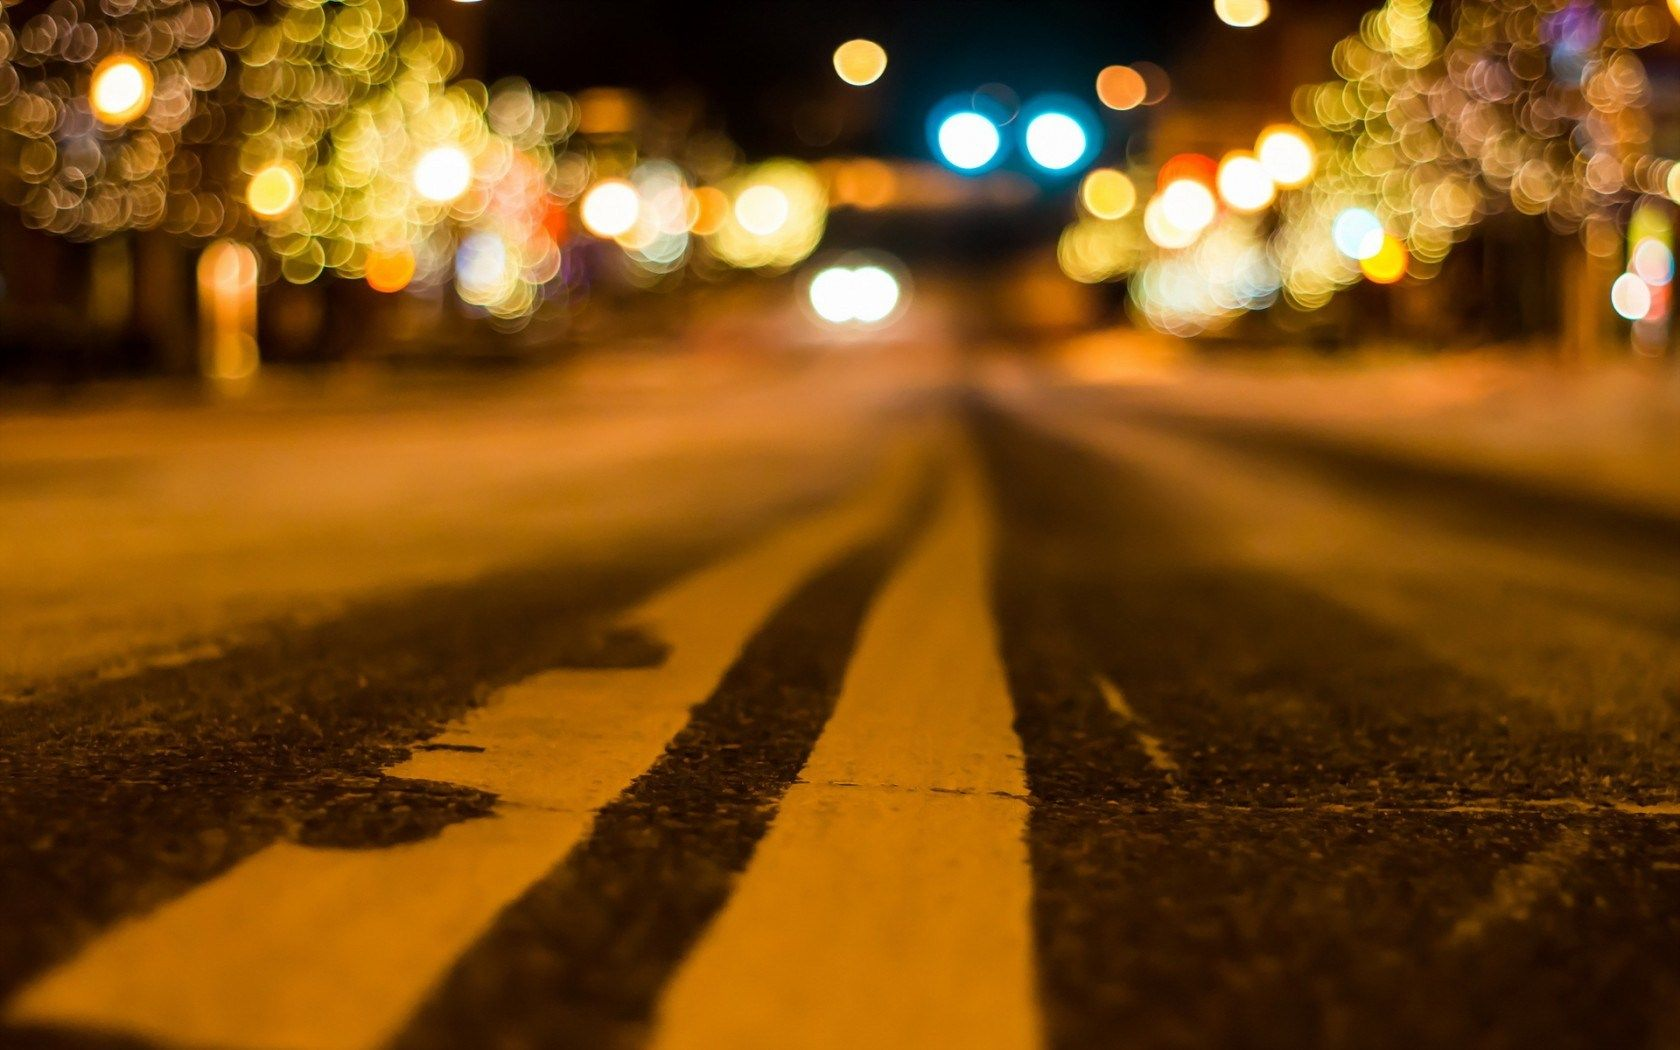 city street lights night - photo #19